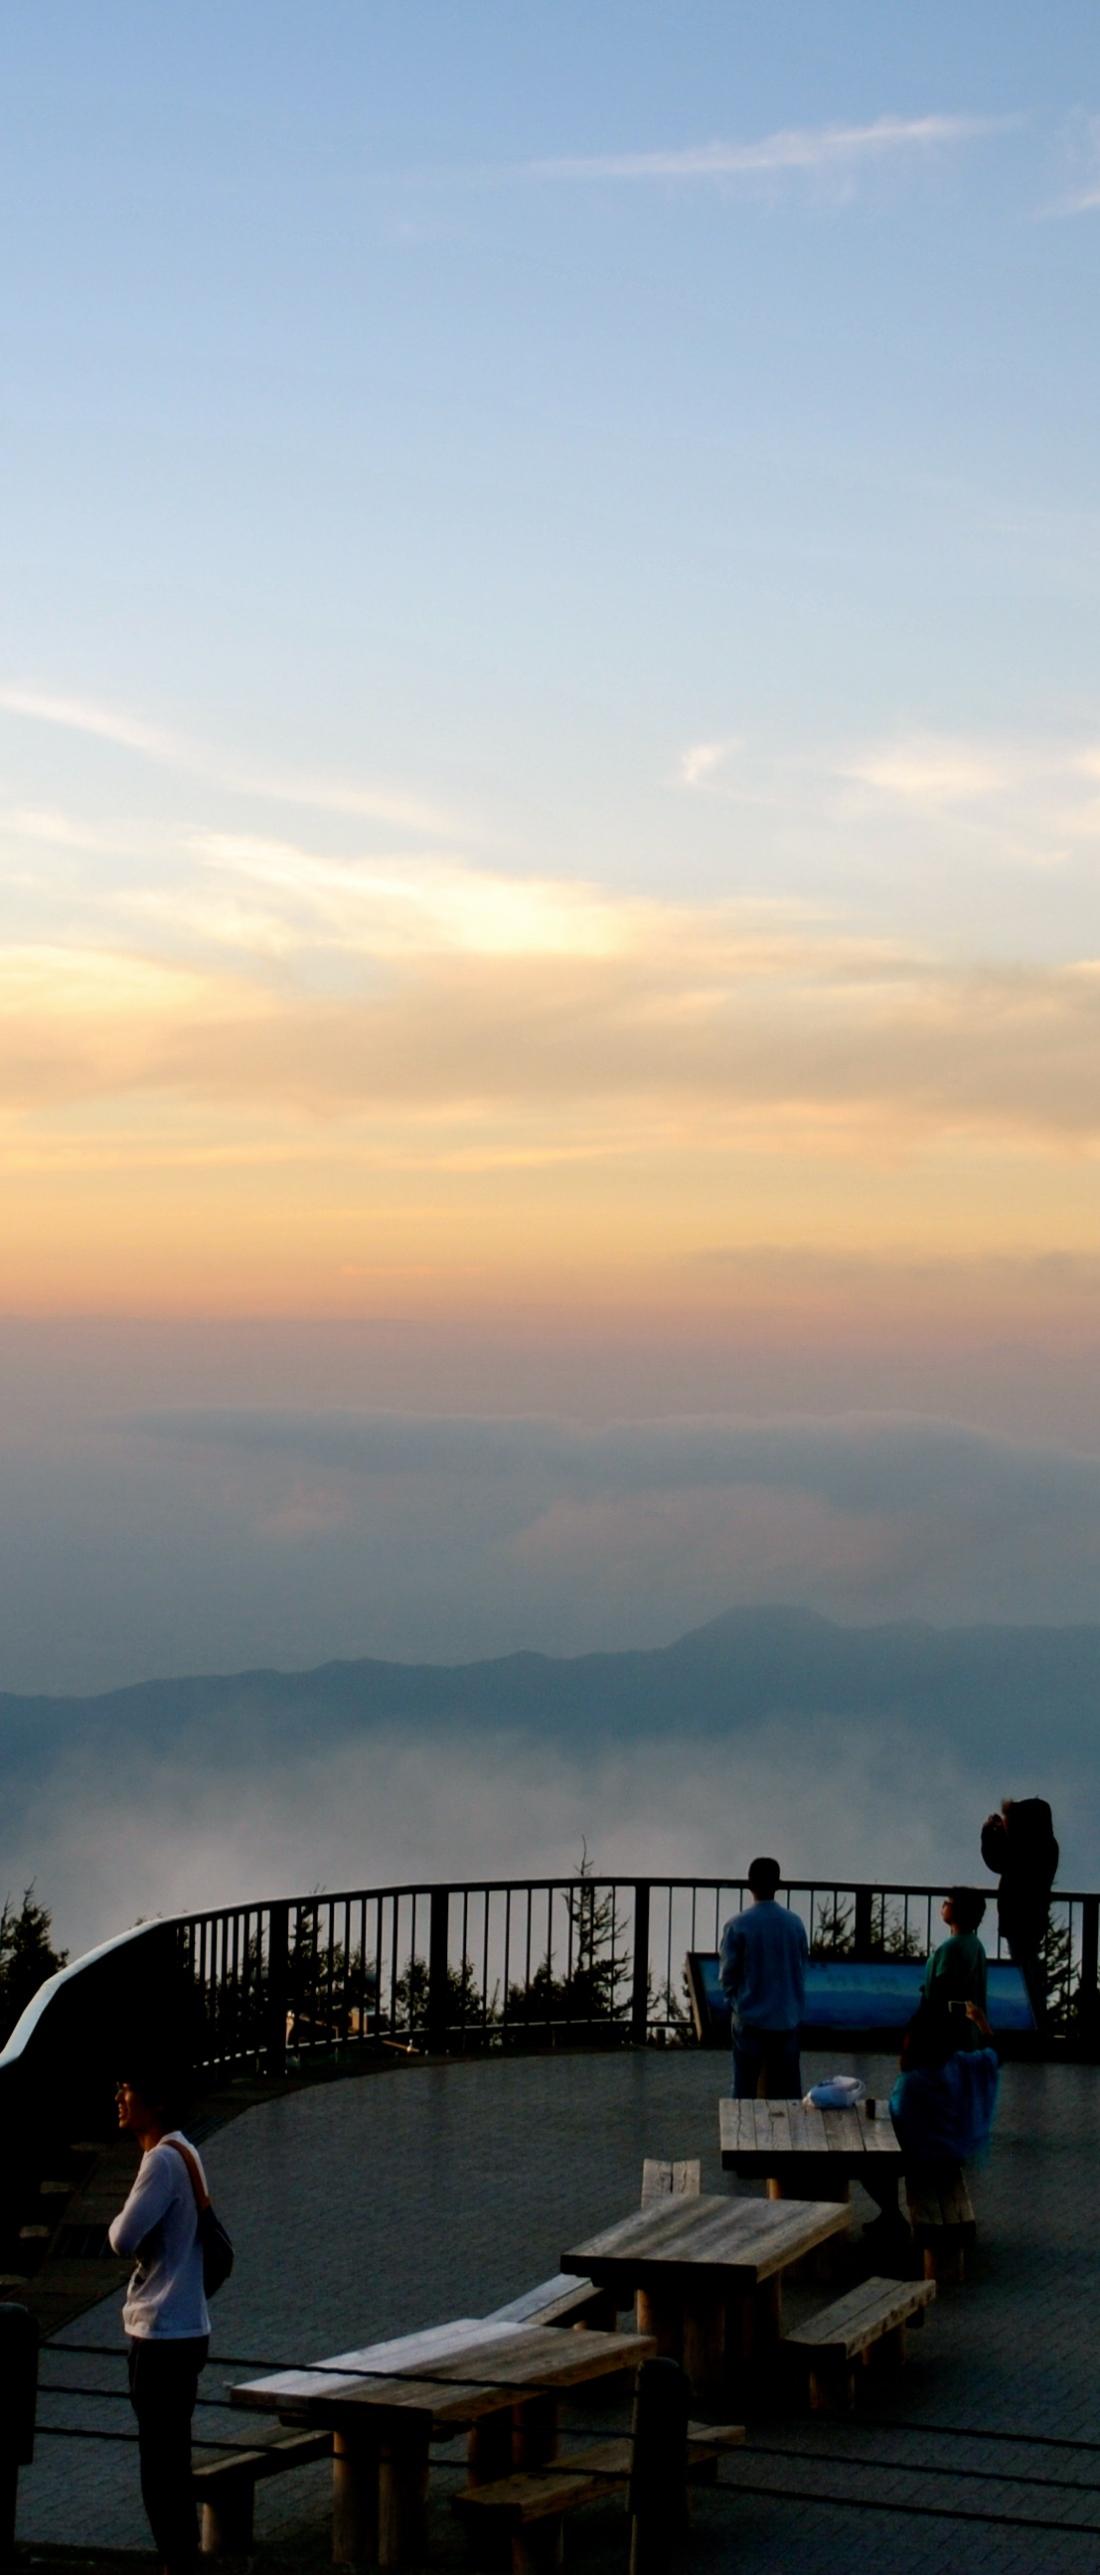 Sunset at cloud level at Station 5 of Mt. Fuji